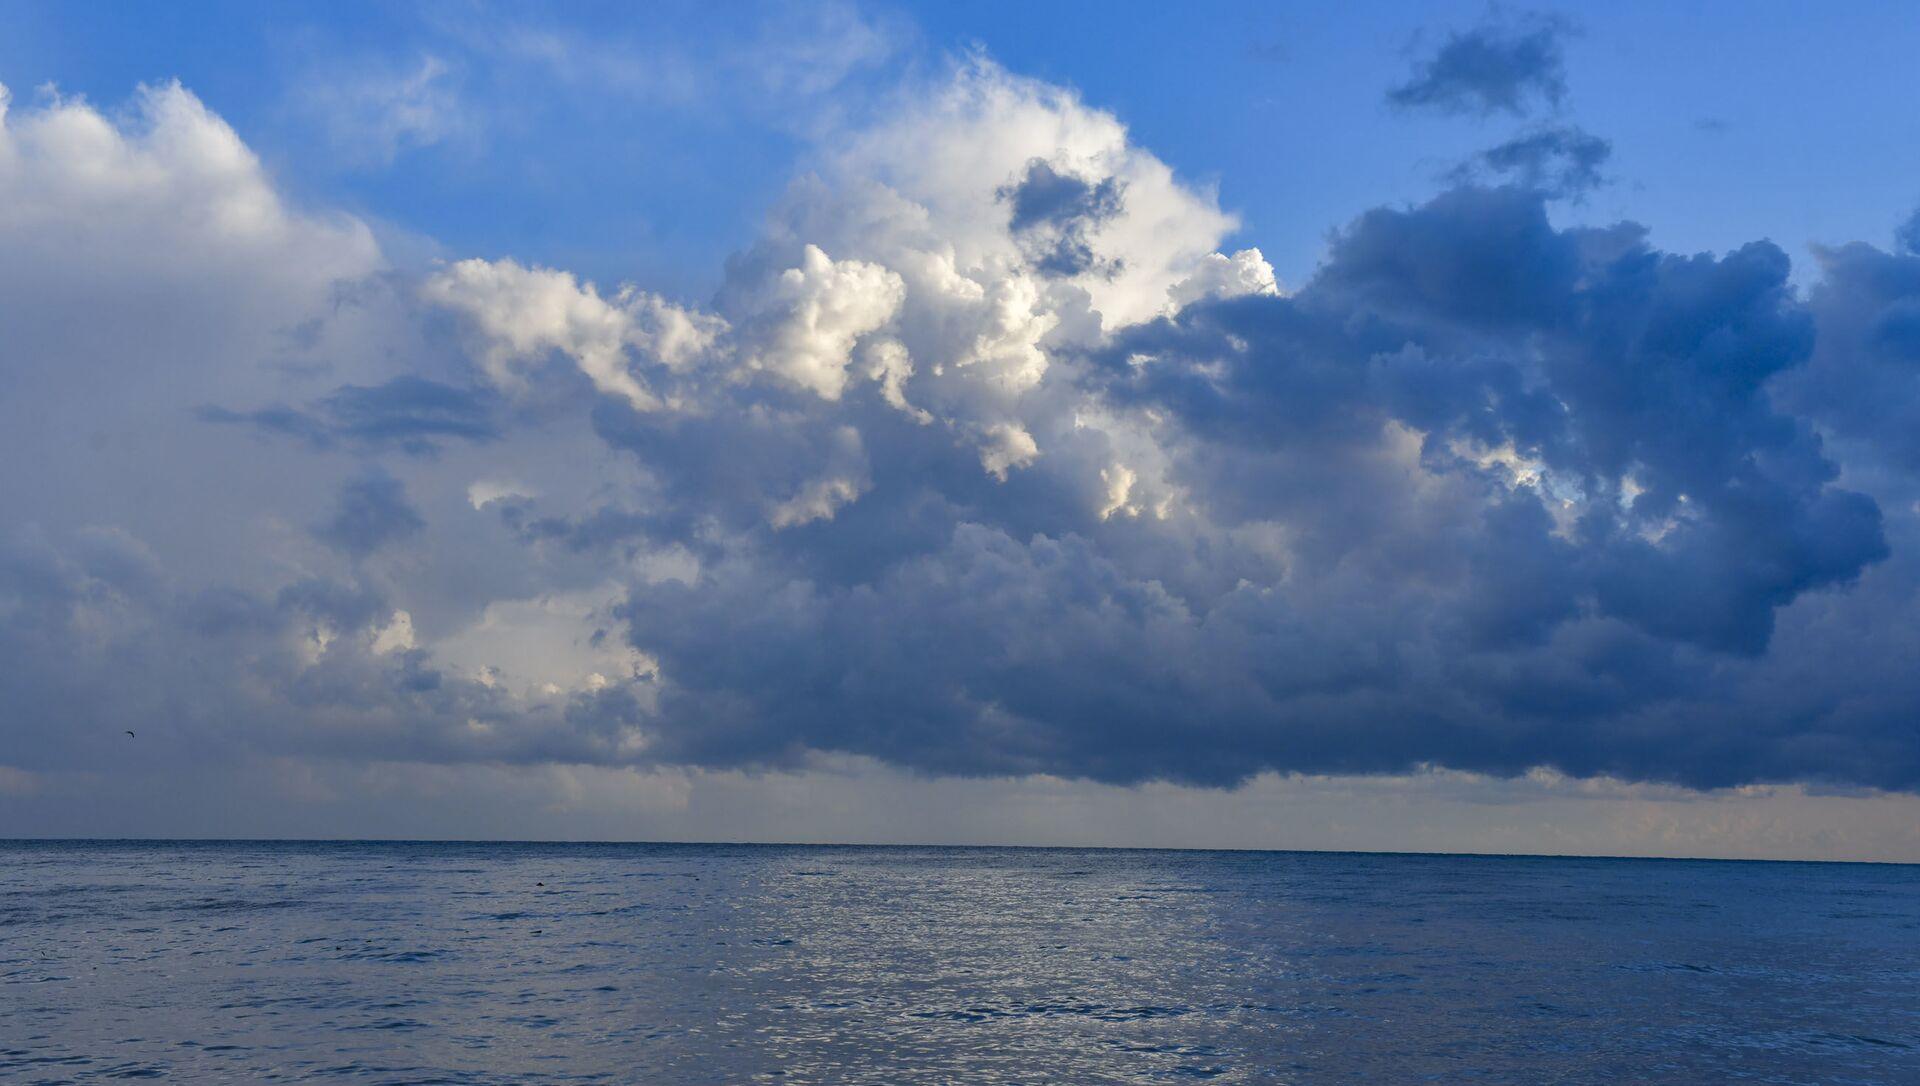 Облака в пасмурную погоду   - Sputnik Абхазия, 1920, 08.09.2021